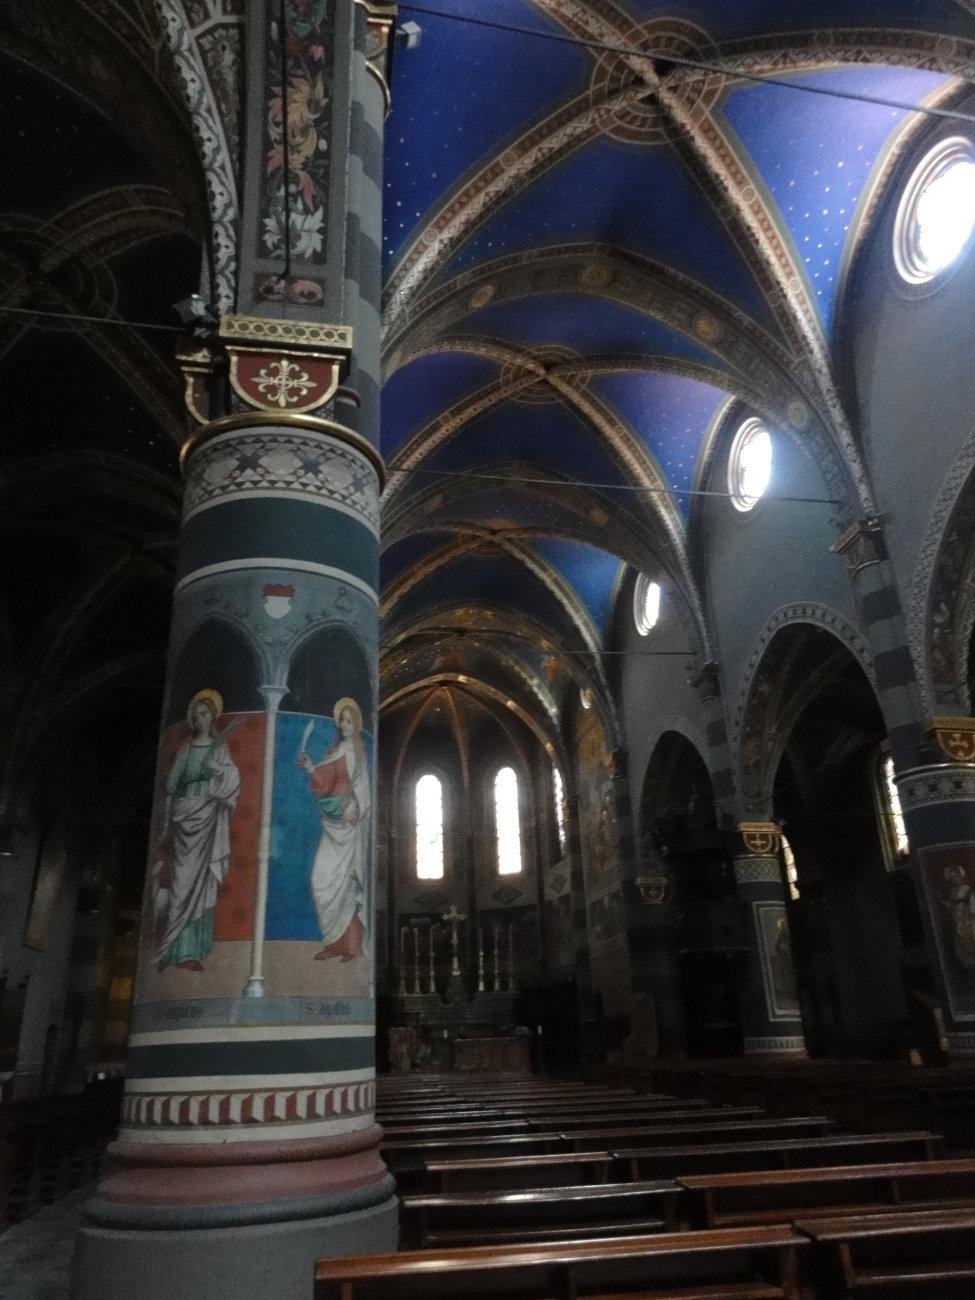 Inside the Church of Pinerollo (Italy, near Turin)